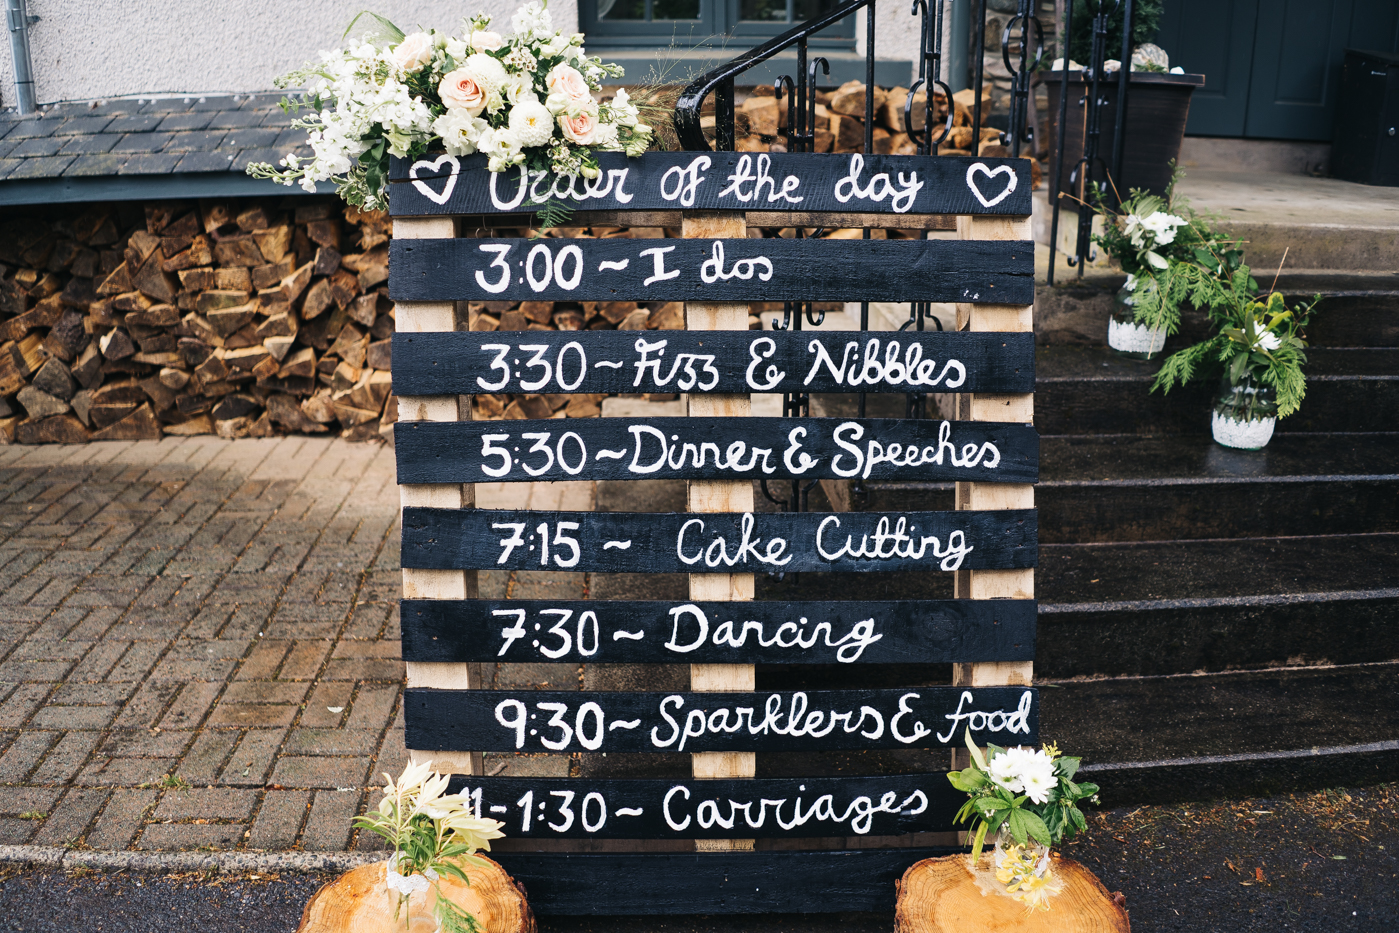 scottish-wedding-trossachs-loch-tay-highlannds-relaxed-photography-photographer-0012.jpg